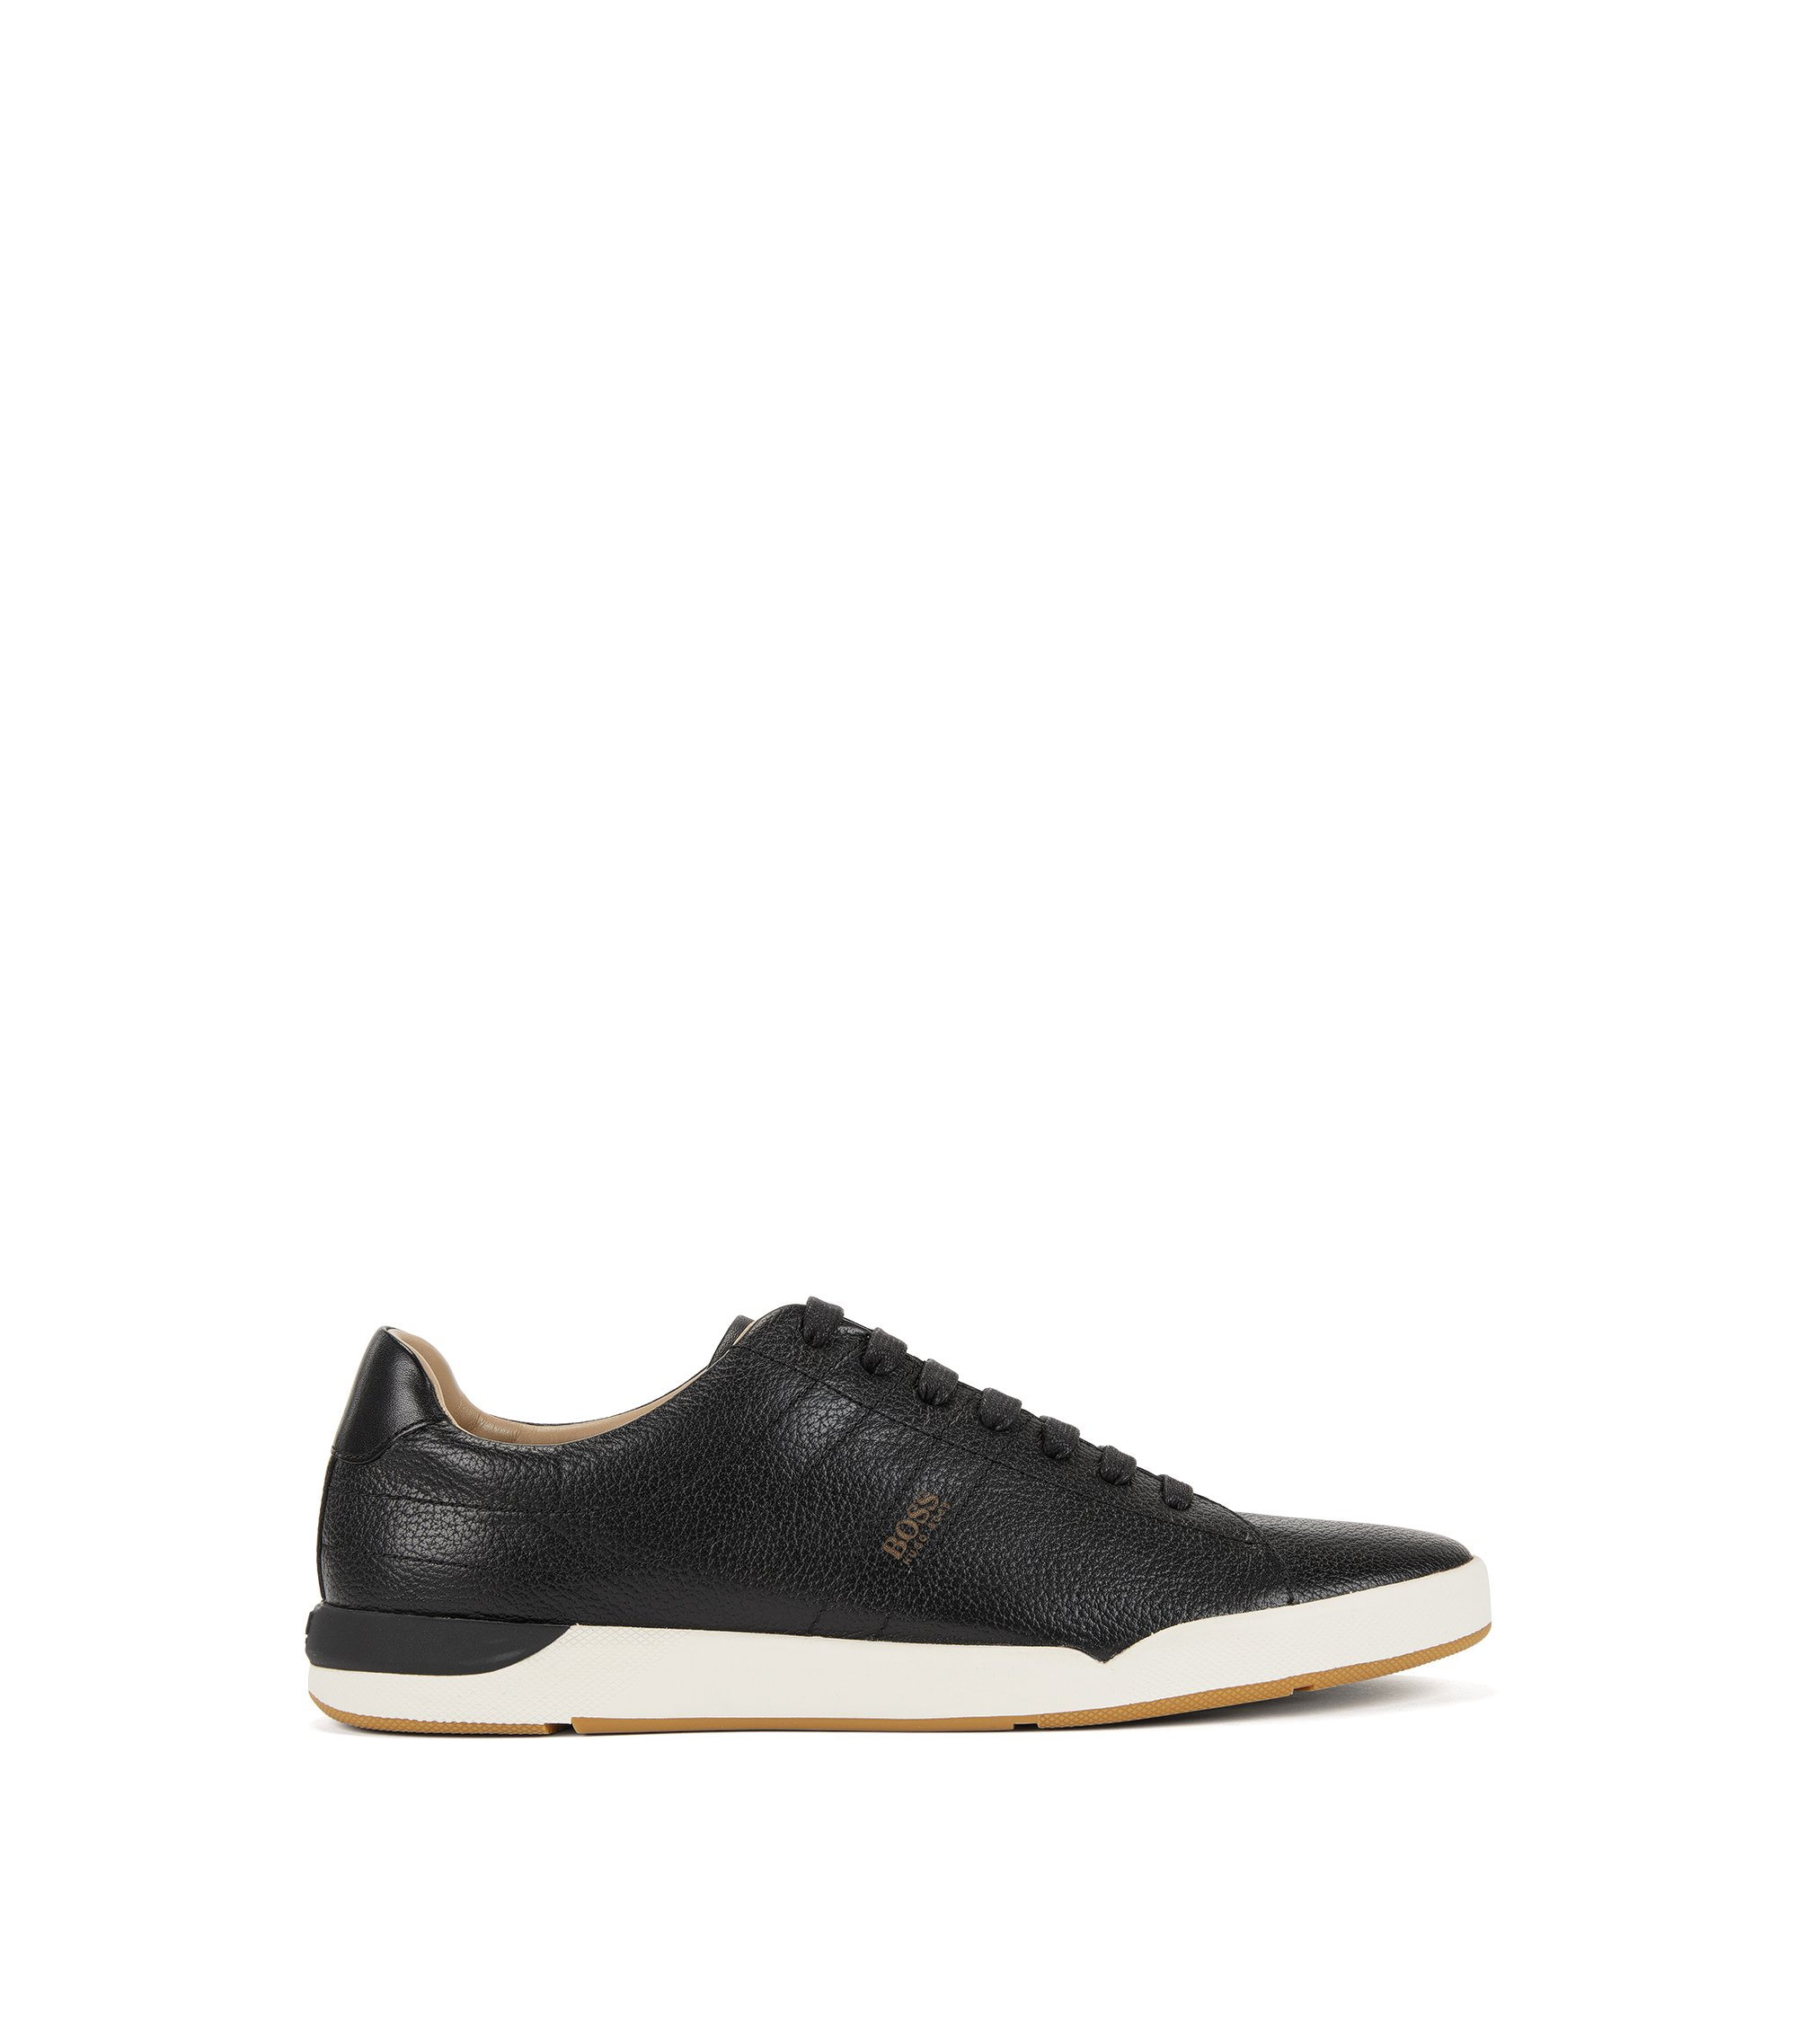 Sneakers aus genarbtem Leder, Schwarz